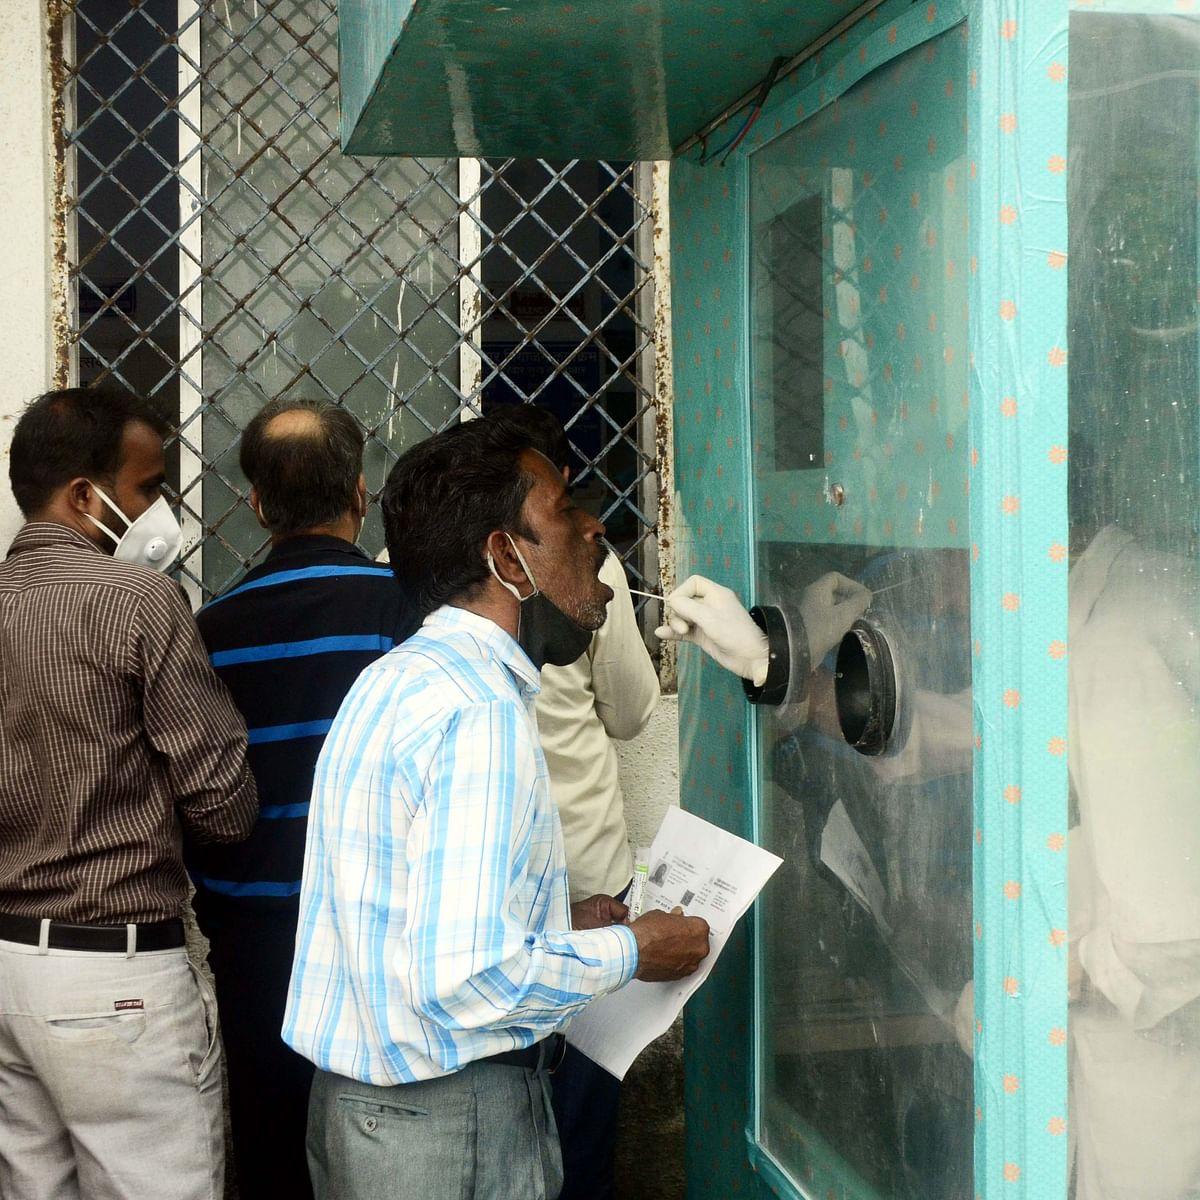 With 194 new corona cases, Bhopal breach 5,000-mark